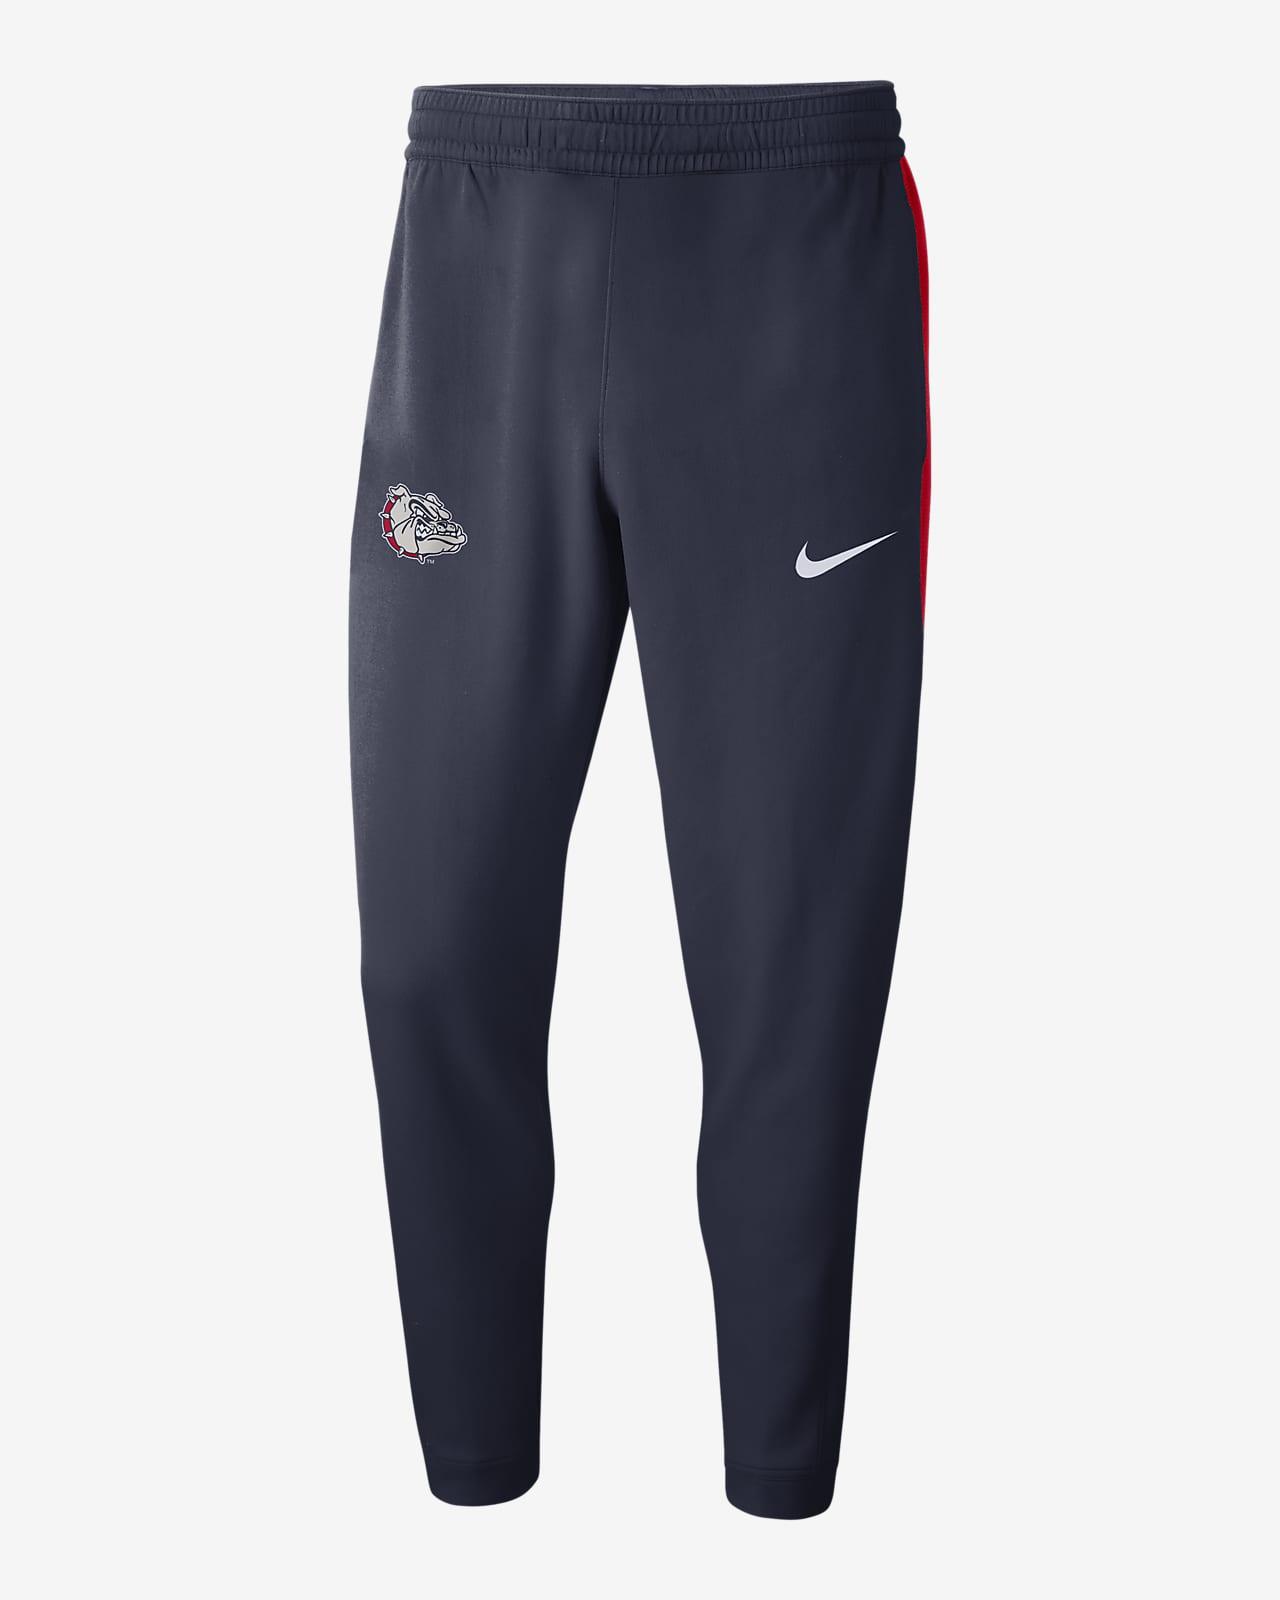 Nike College Spotlight (Gonzaga) Men's Pants